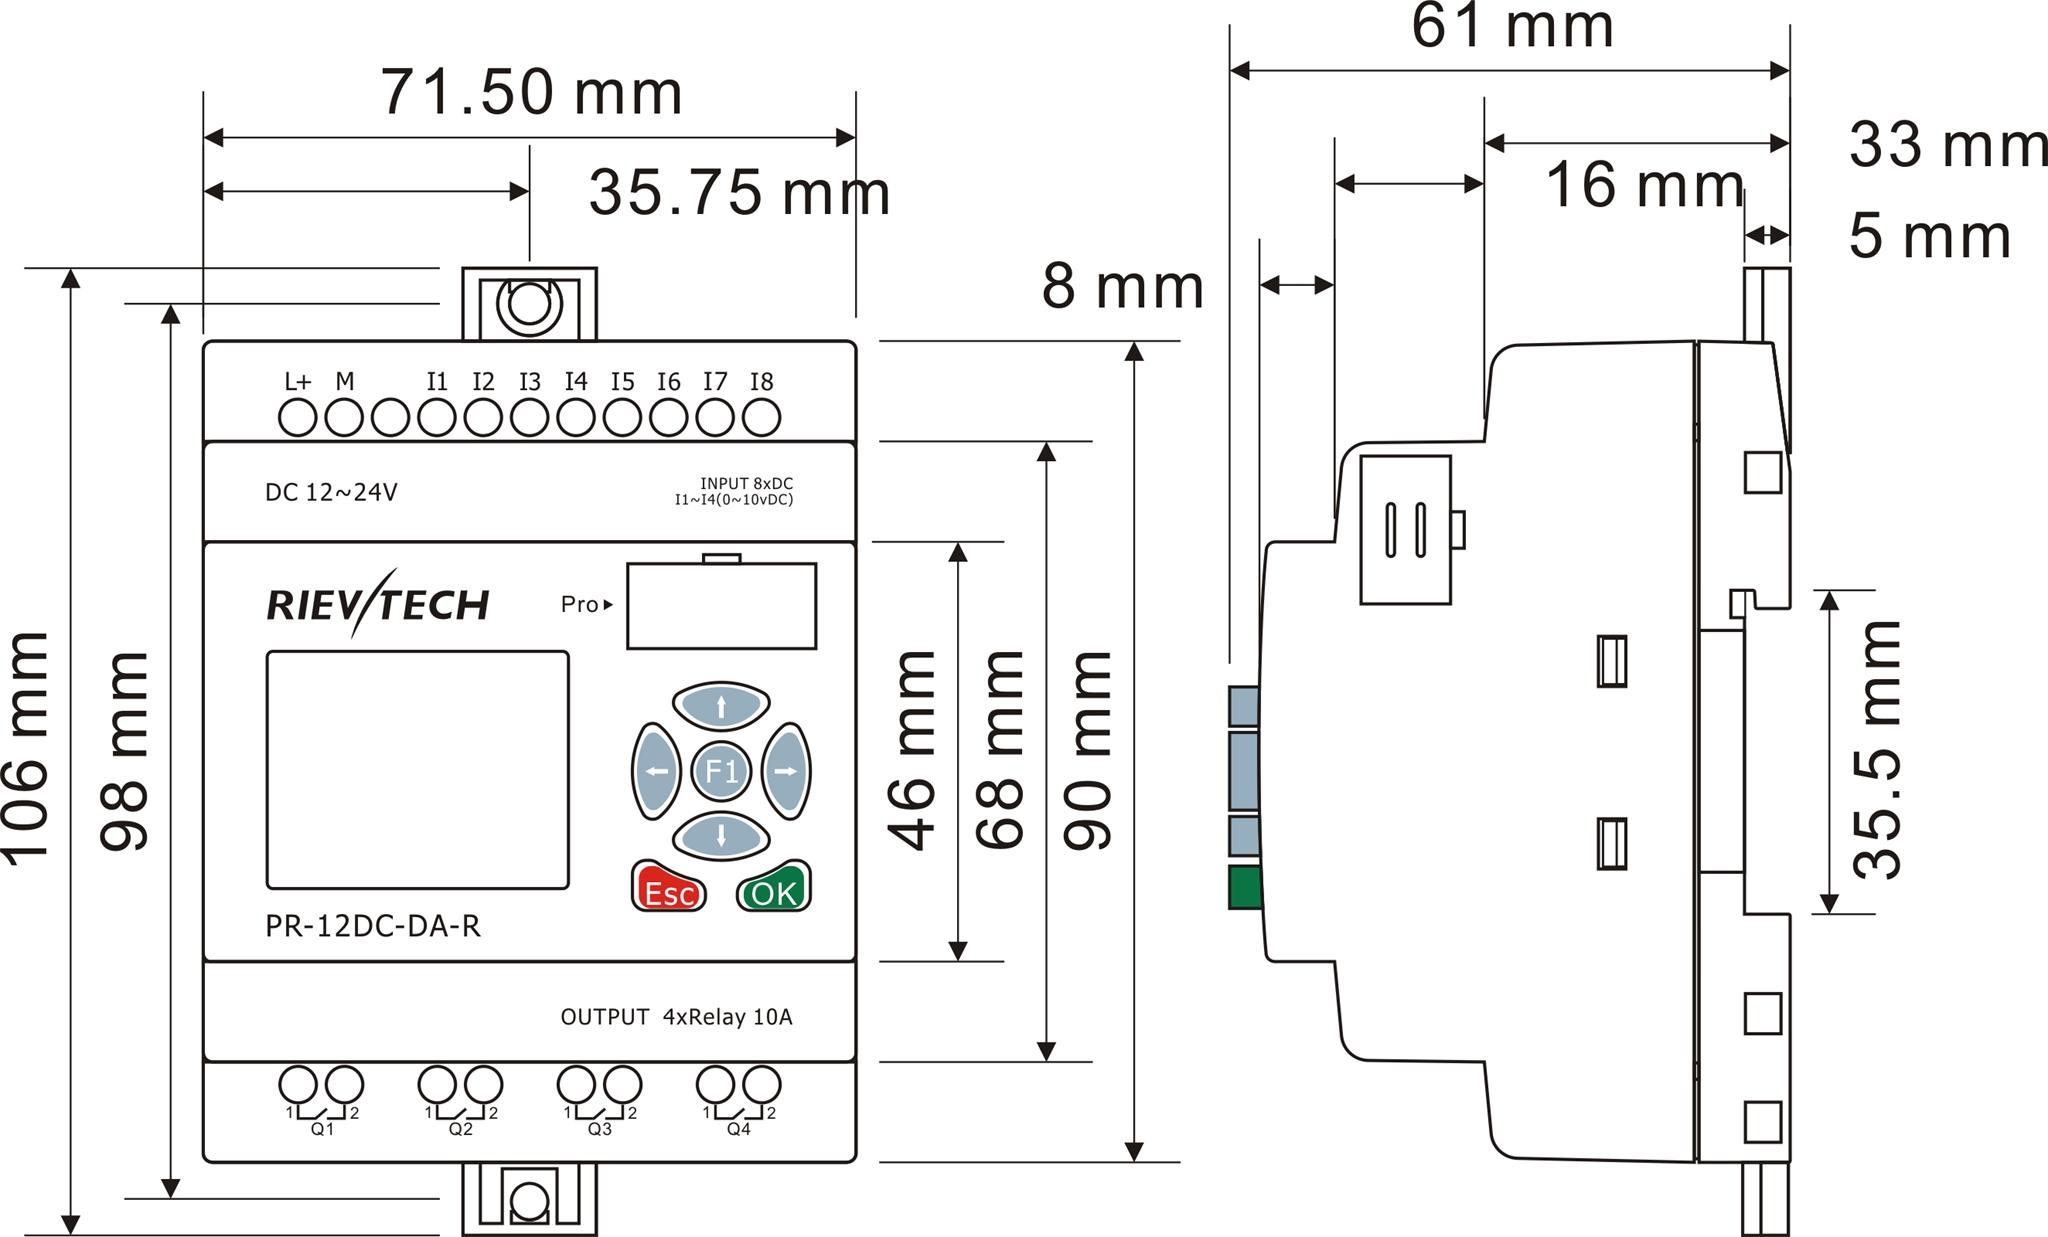 Opacmare Perelle Wiring Diagram Page 5 And Schematics Plc Diagrams Williamson Oil Furnace Source Pr 12dc Da R Micro Siemens Logo Intelligent Controller